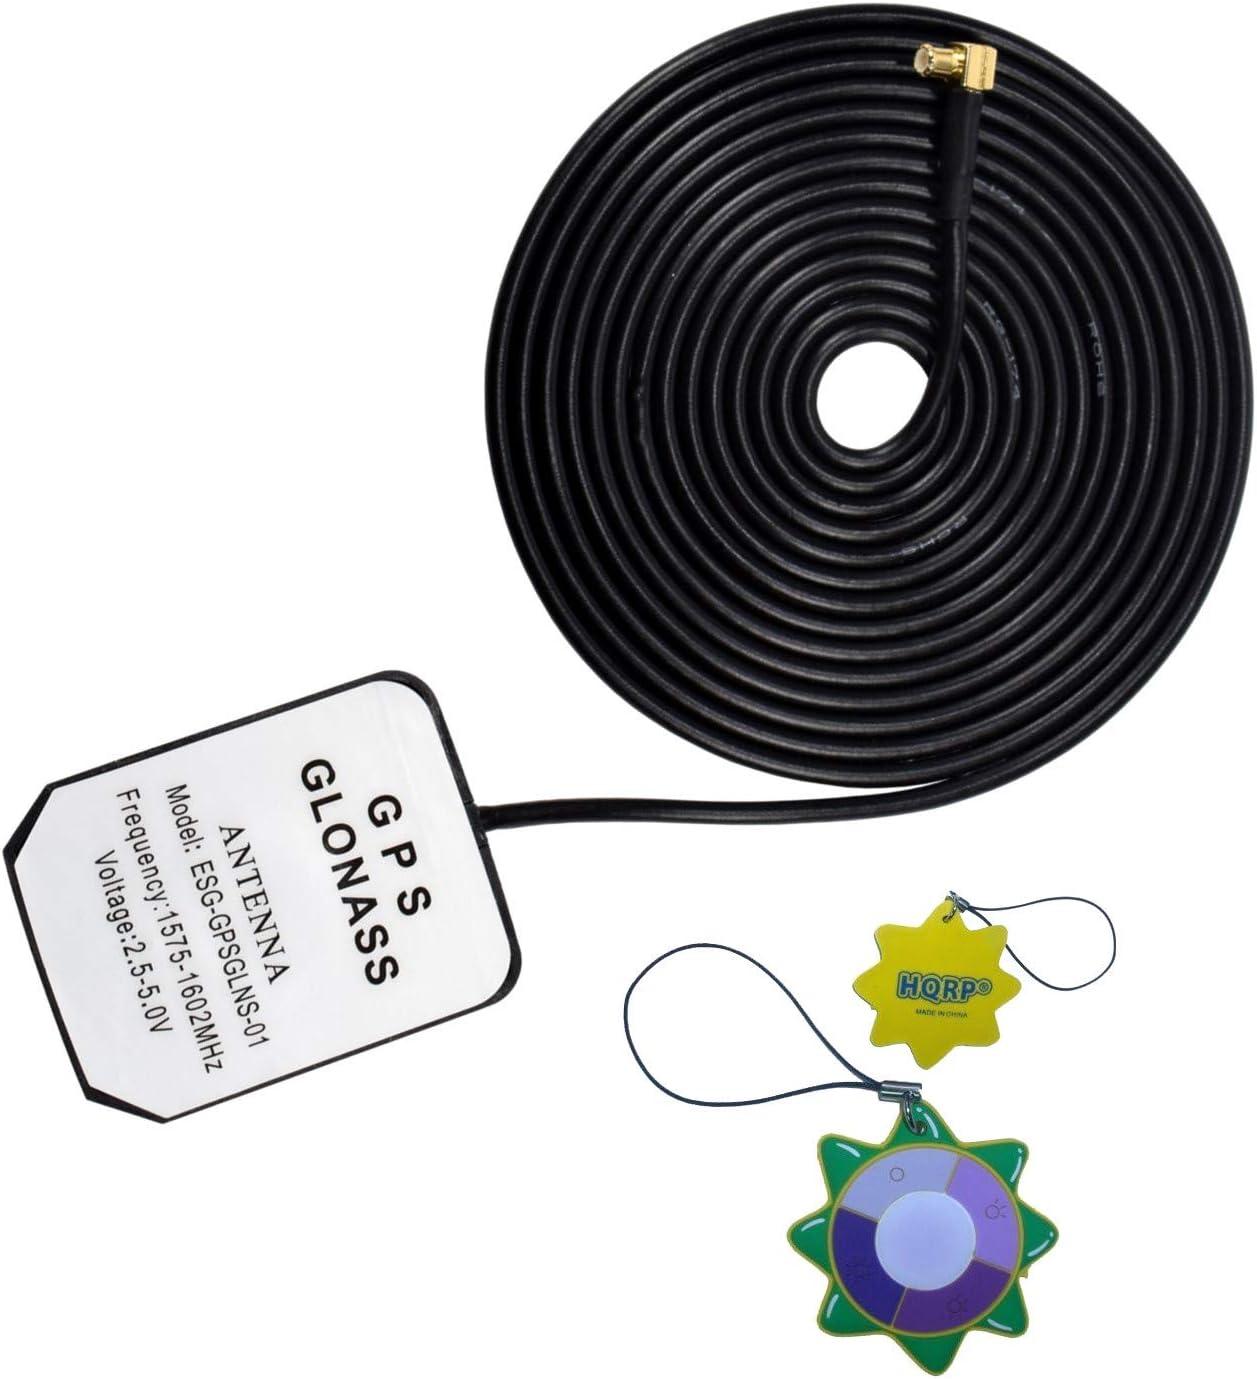 HQRP Antena Externa GPS amplificada 1575.42 MHz de Montaje magnético para Garmin Quest (010-00306-00) / Garmin Quest 2 (010-00454-00) + HQRP medidor del Sol